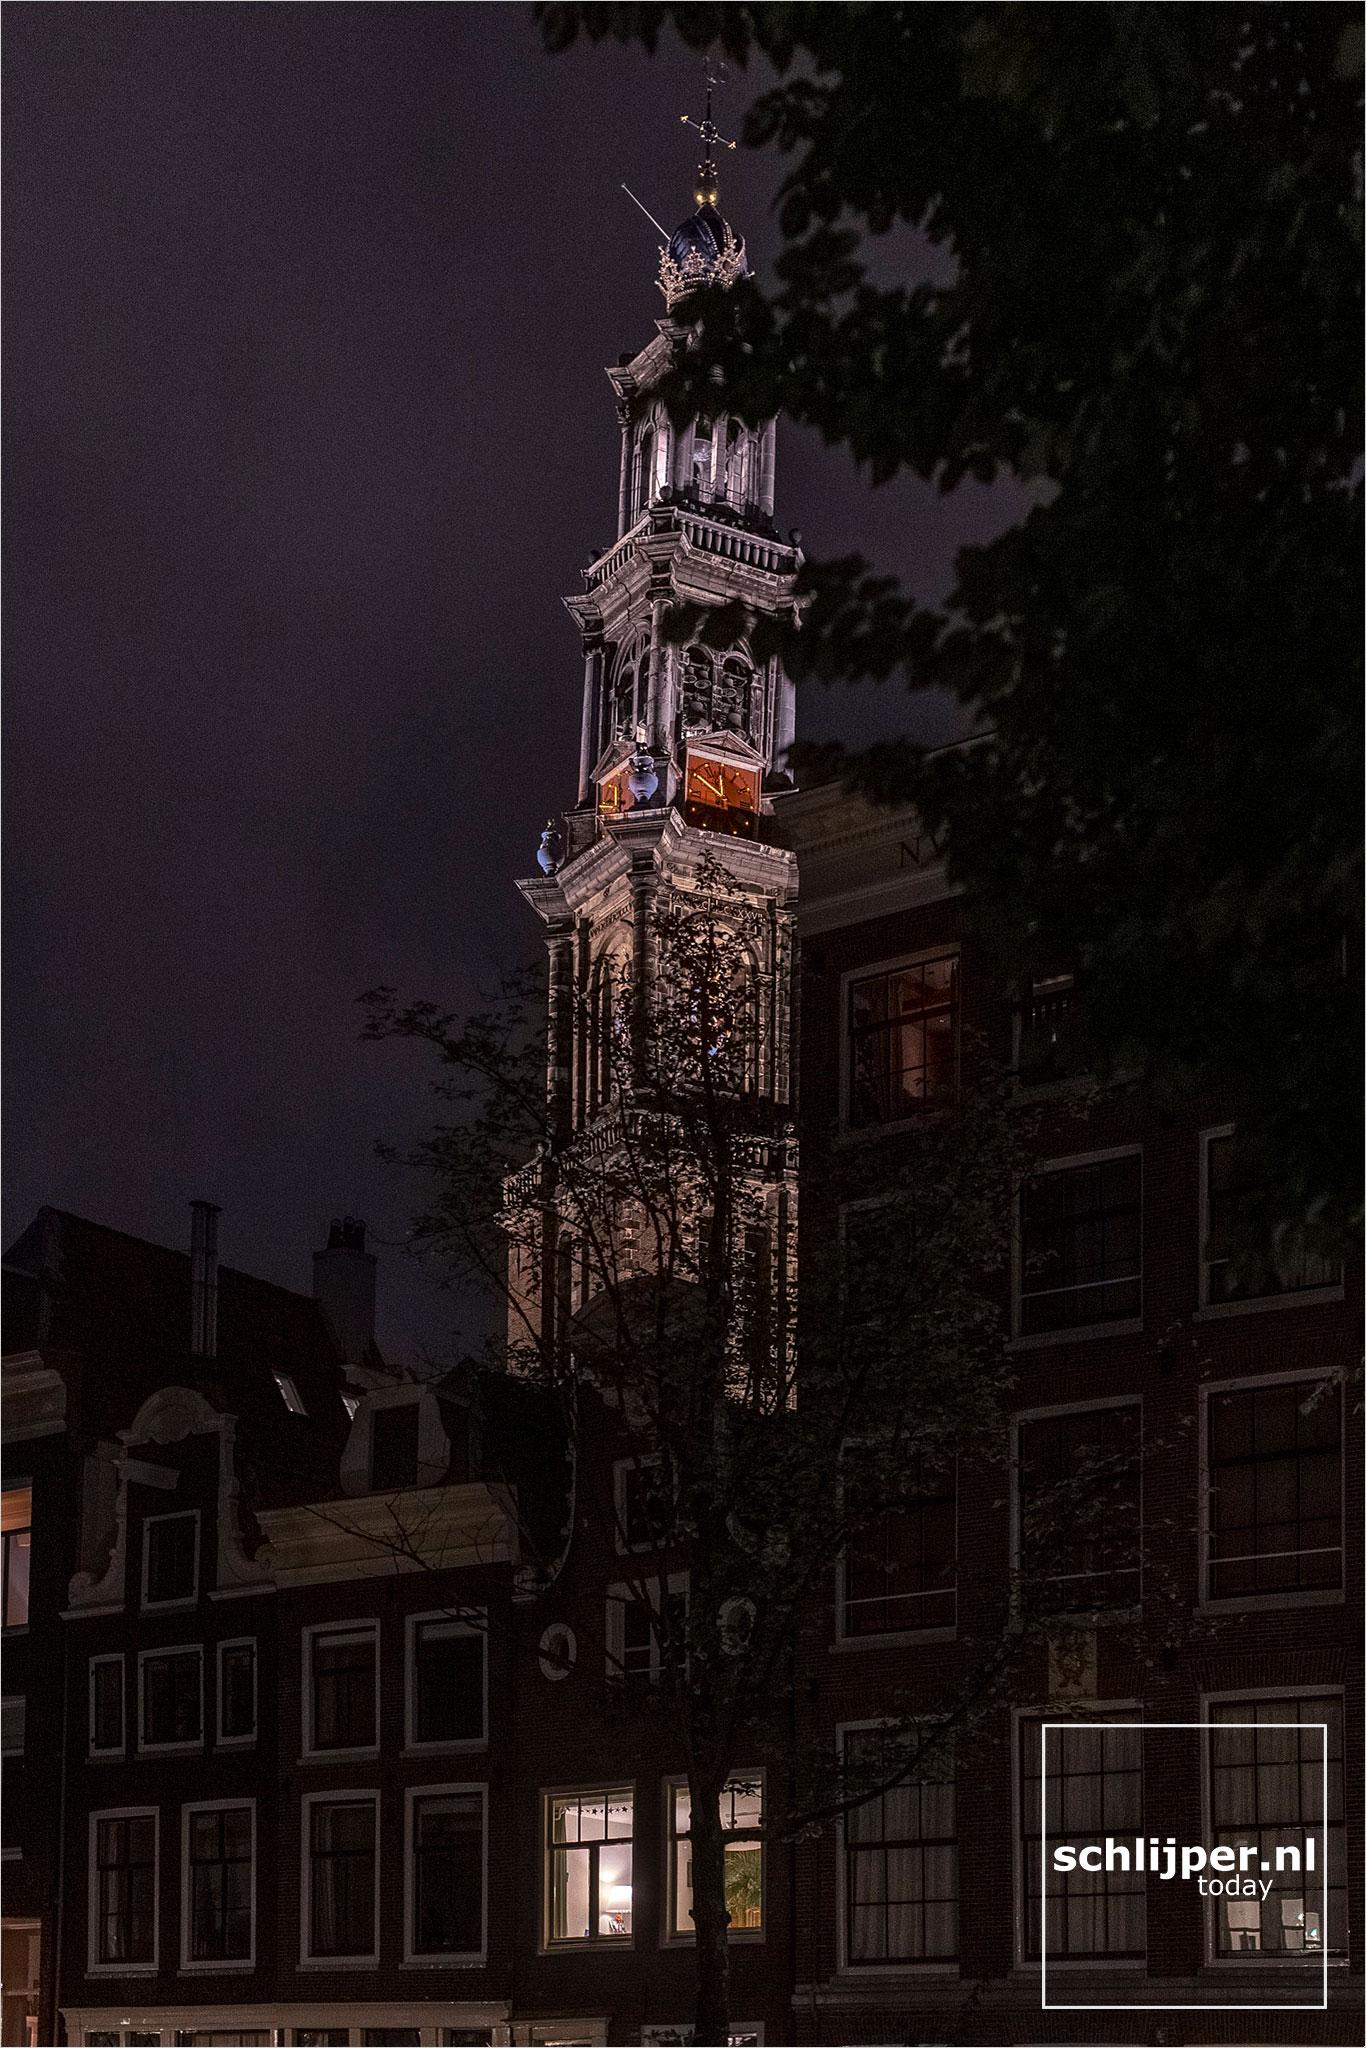 The Netherlands, Amsterdam, 28 augustus 2021